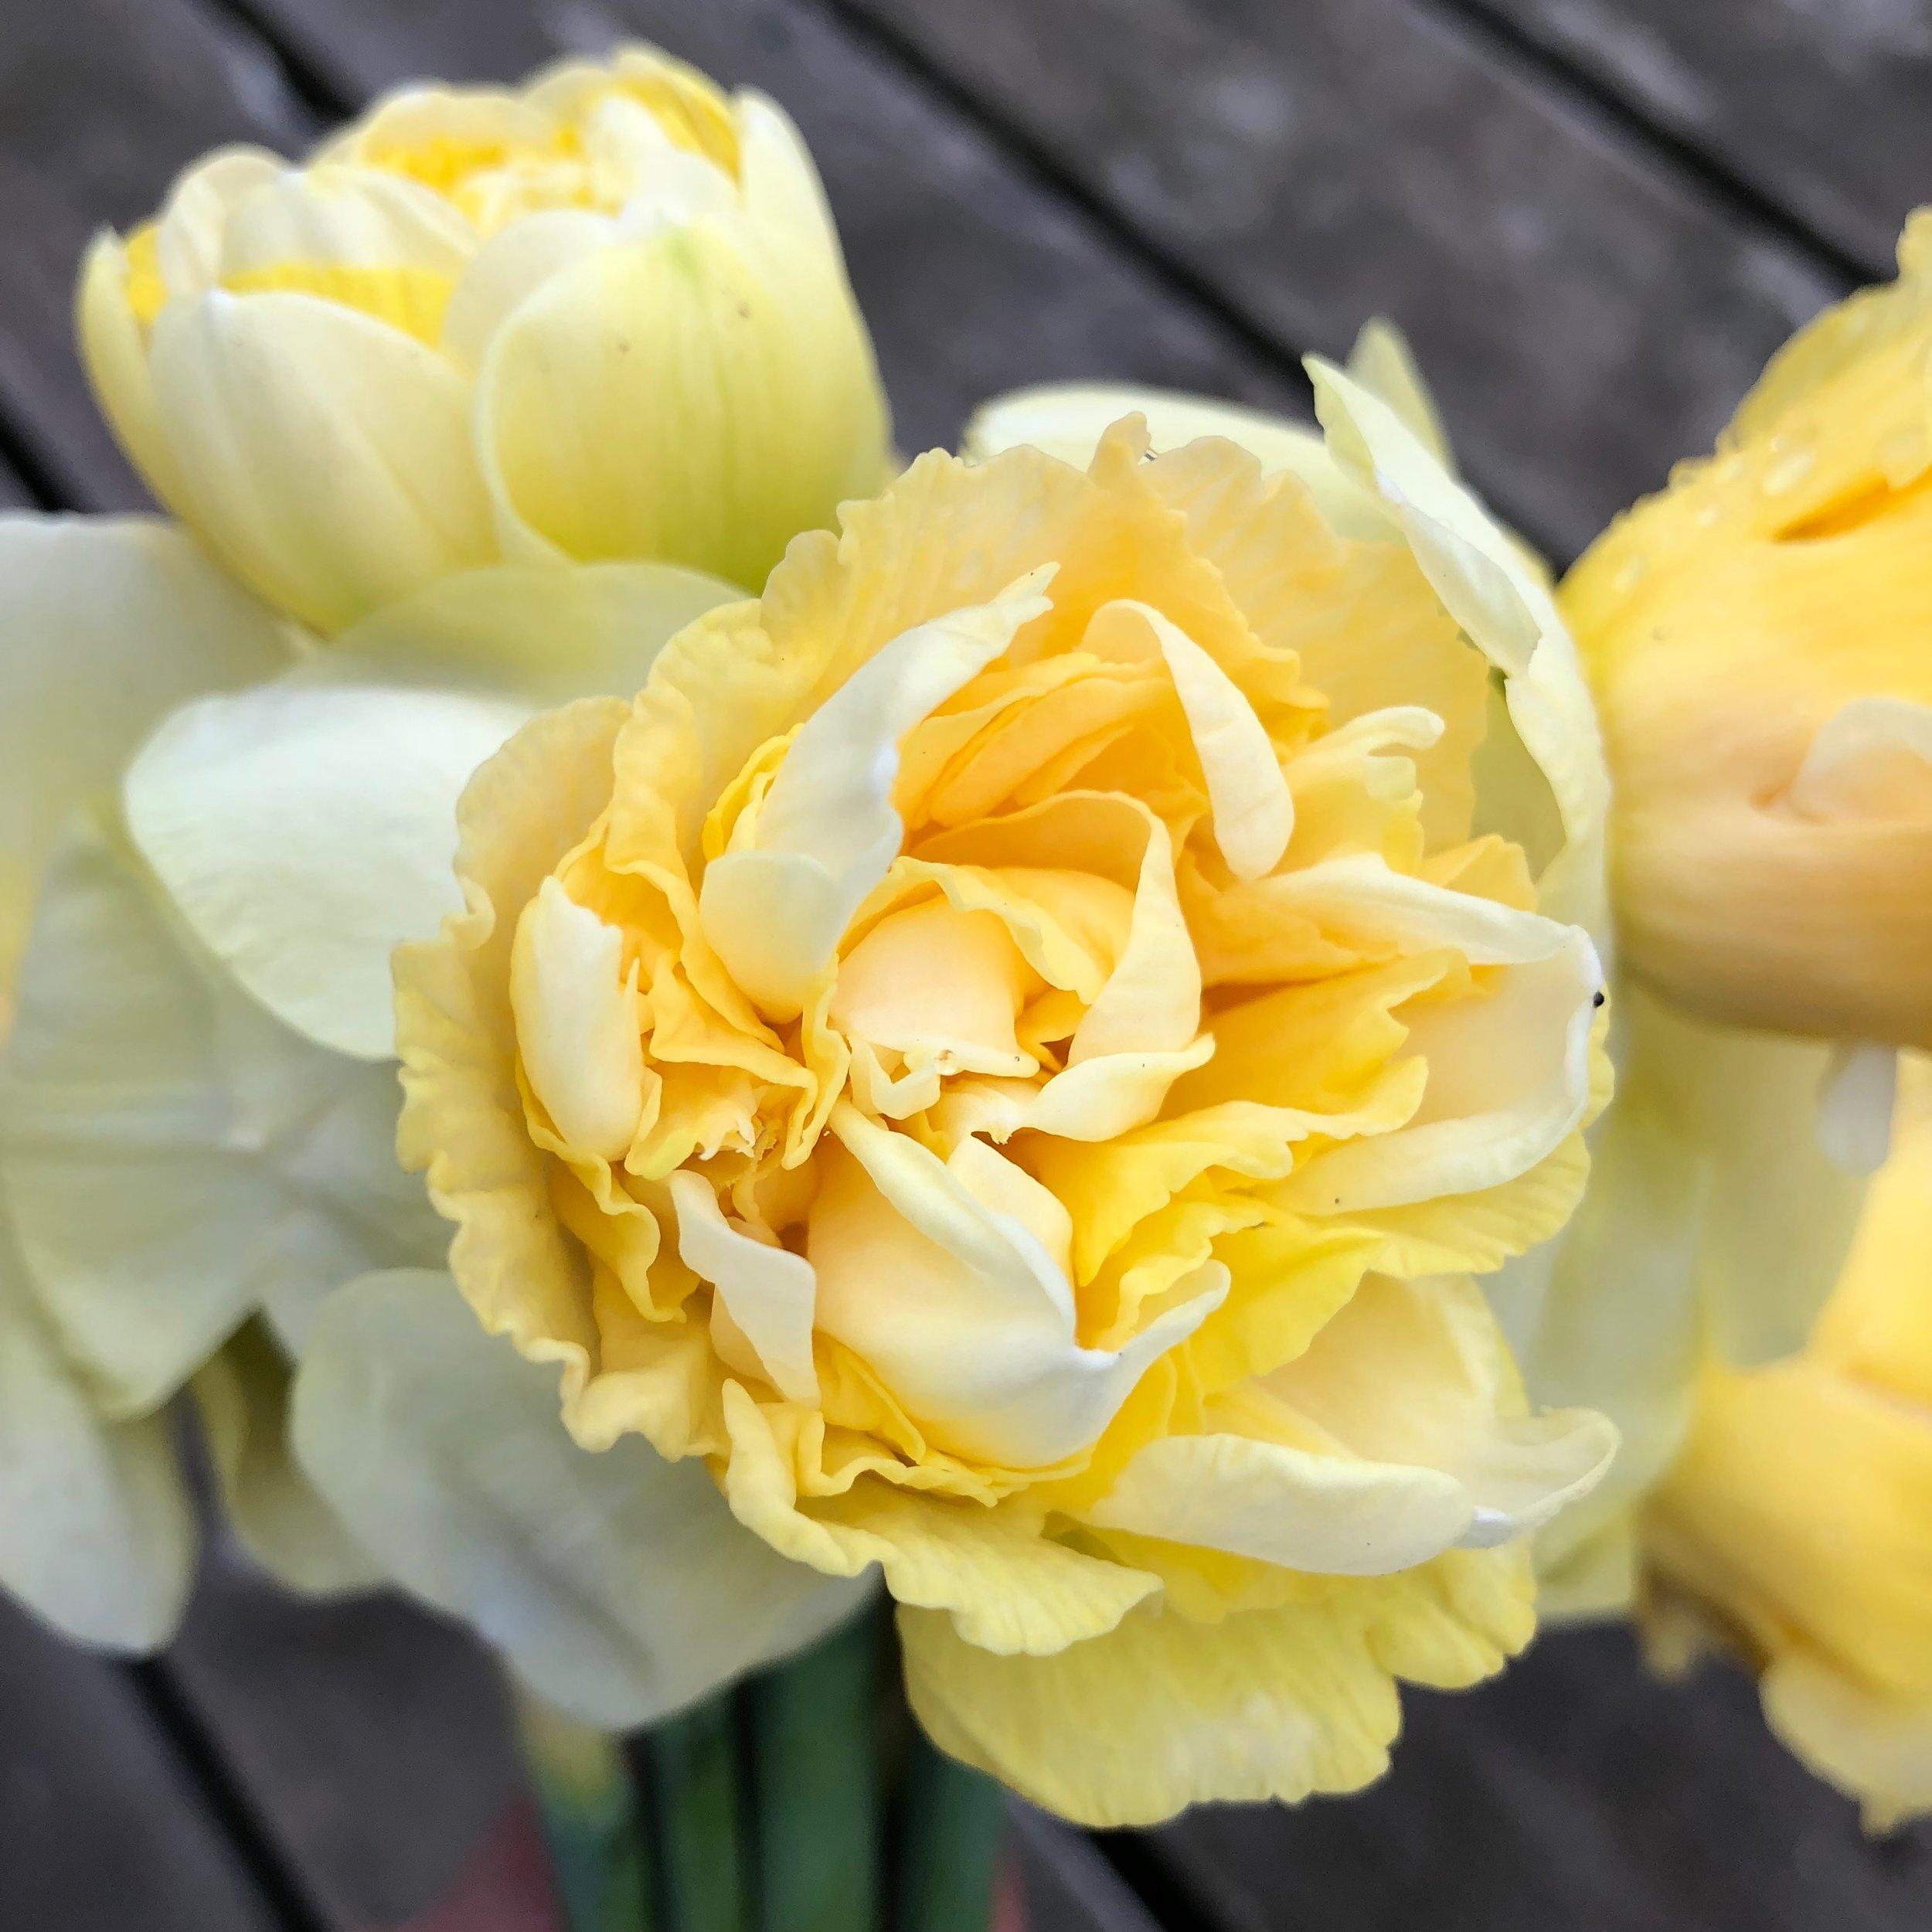 Art Design Daffodil